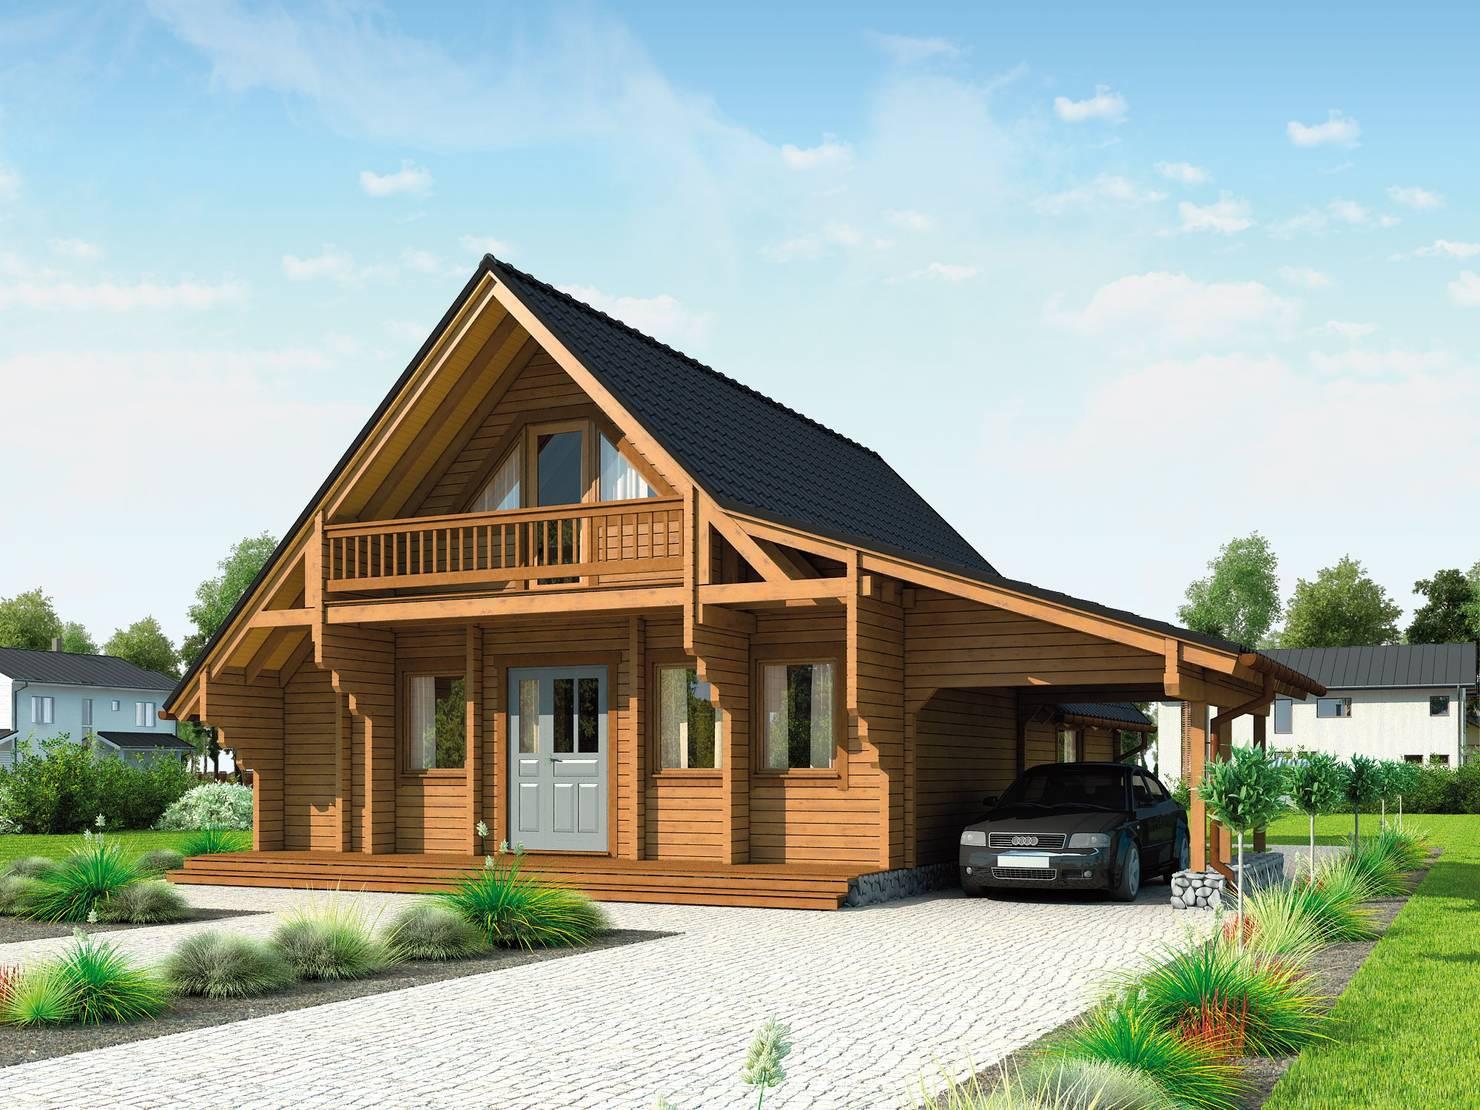 Проект дешевого деревянного дома за 1,6 млн